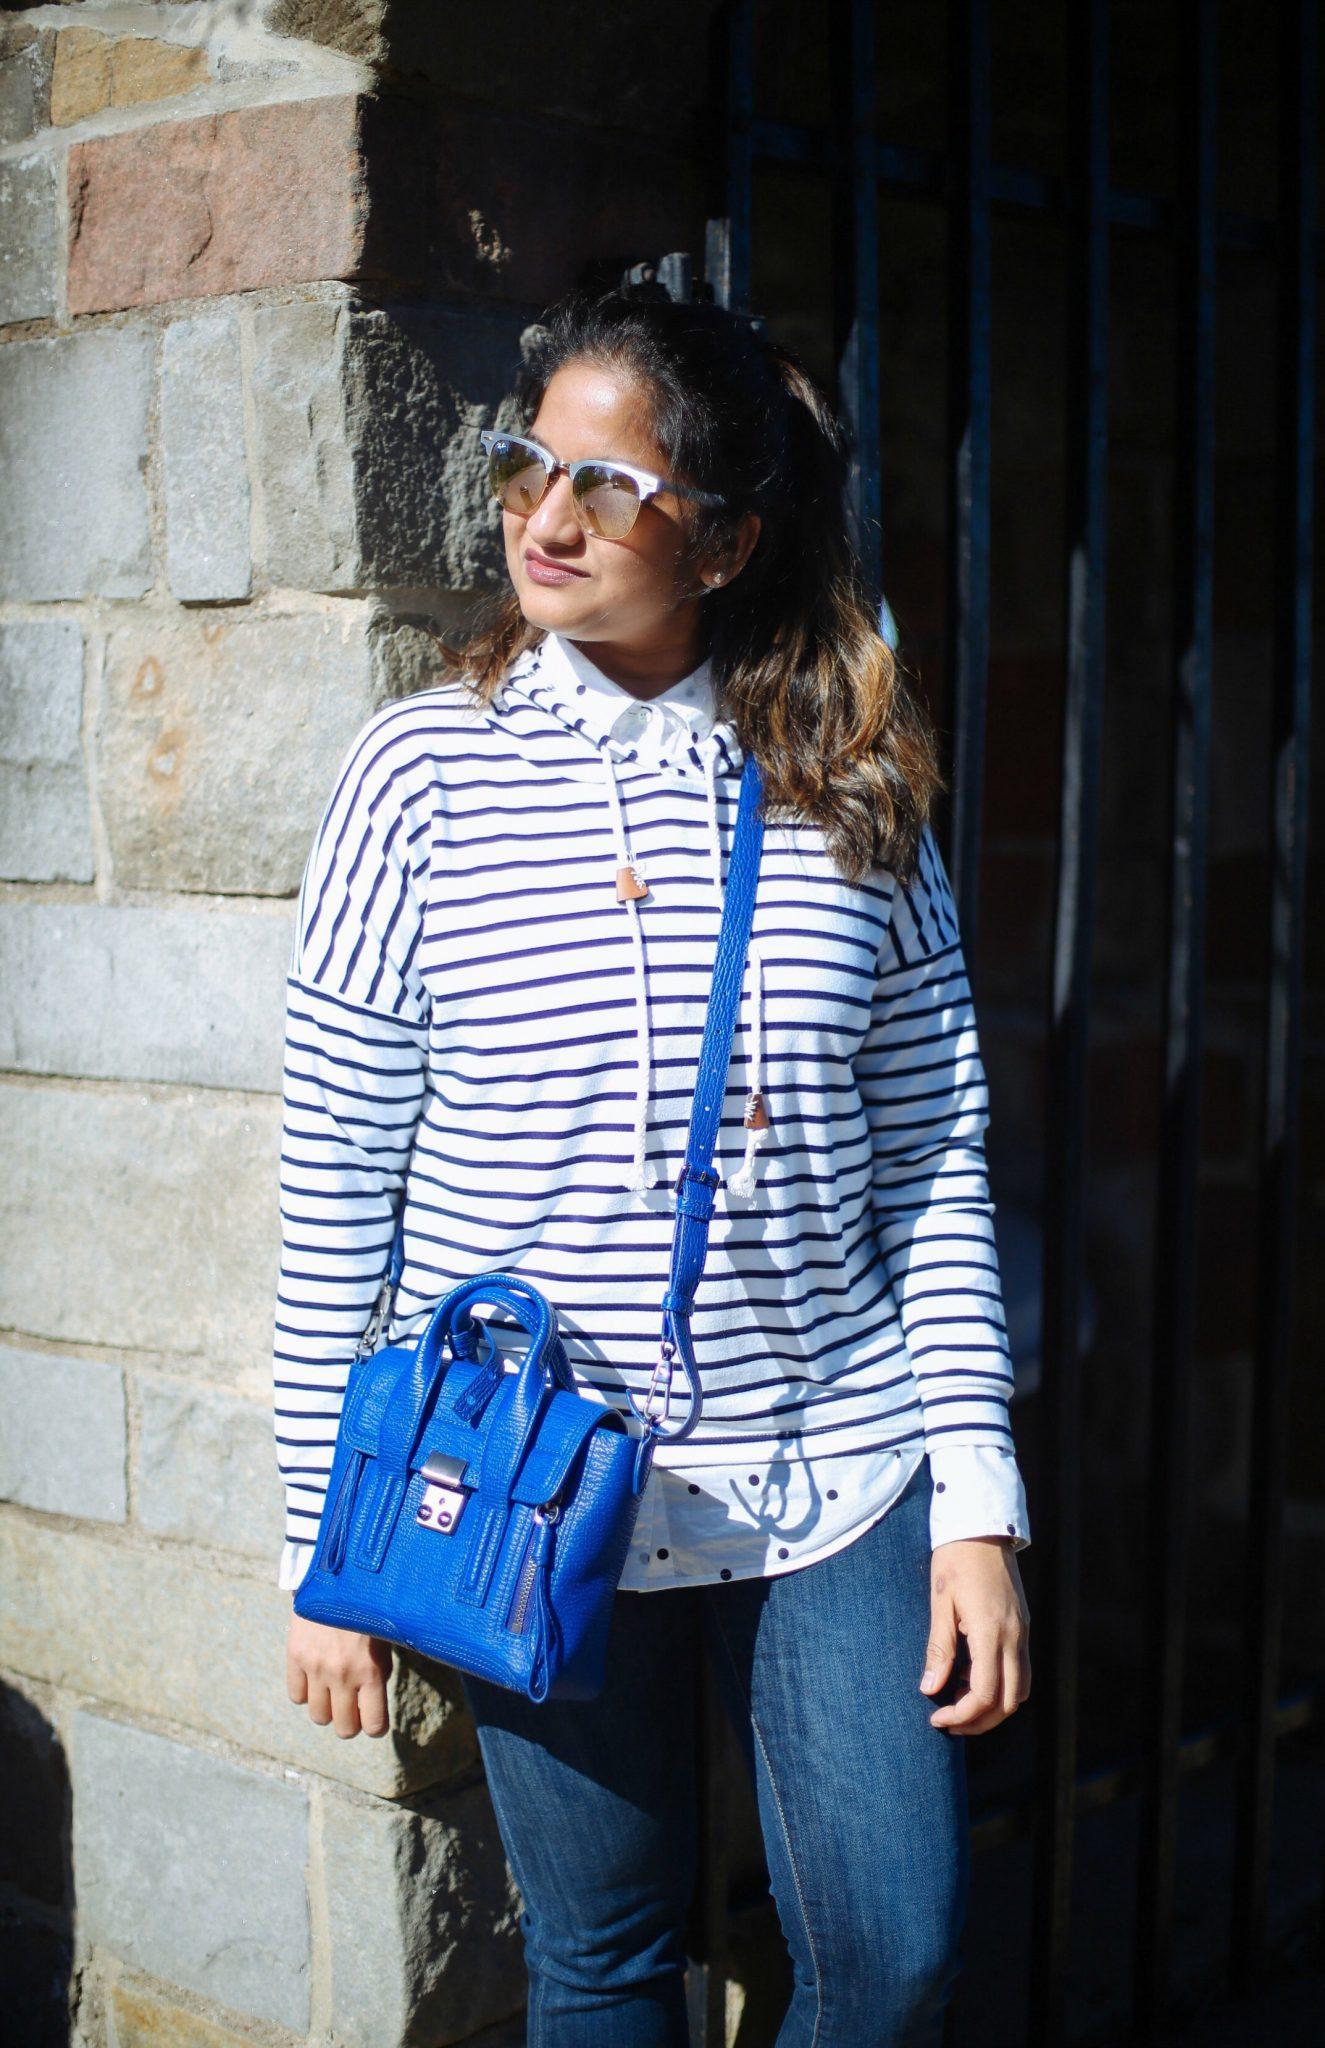 chic-ways-to-wear-a-sweatshirt